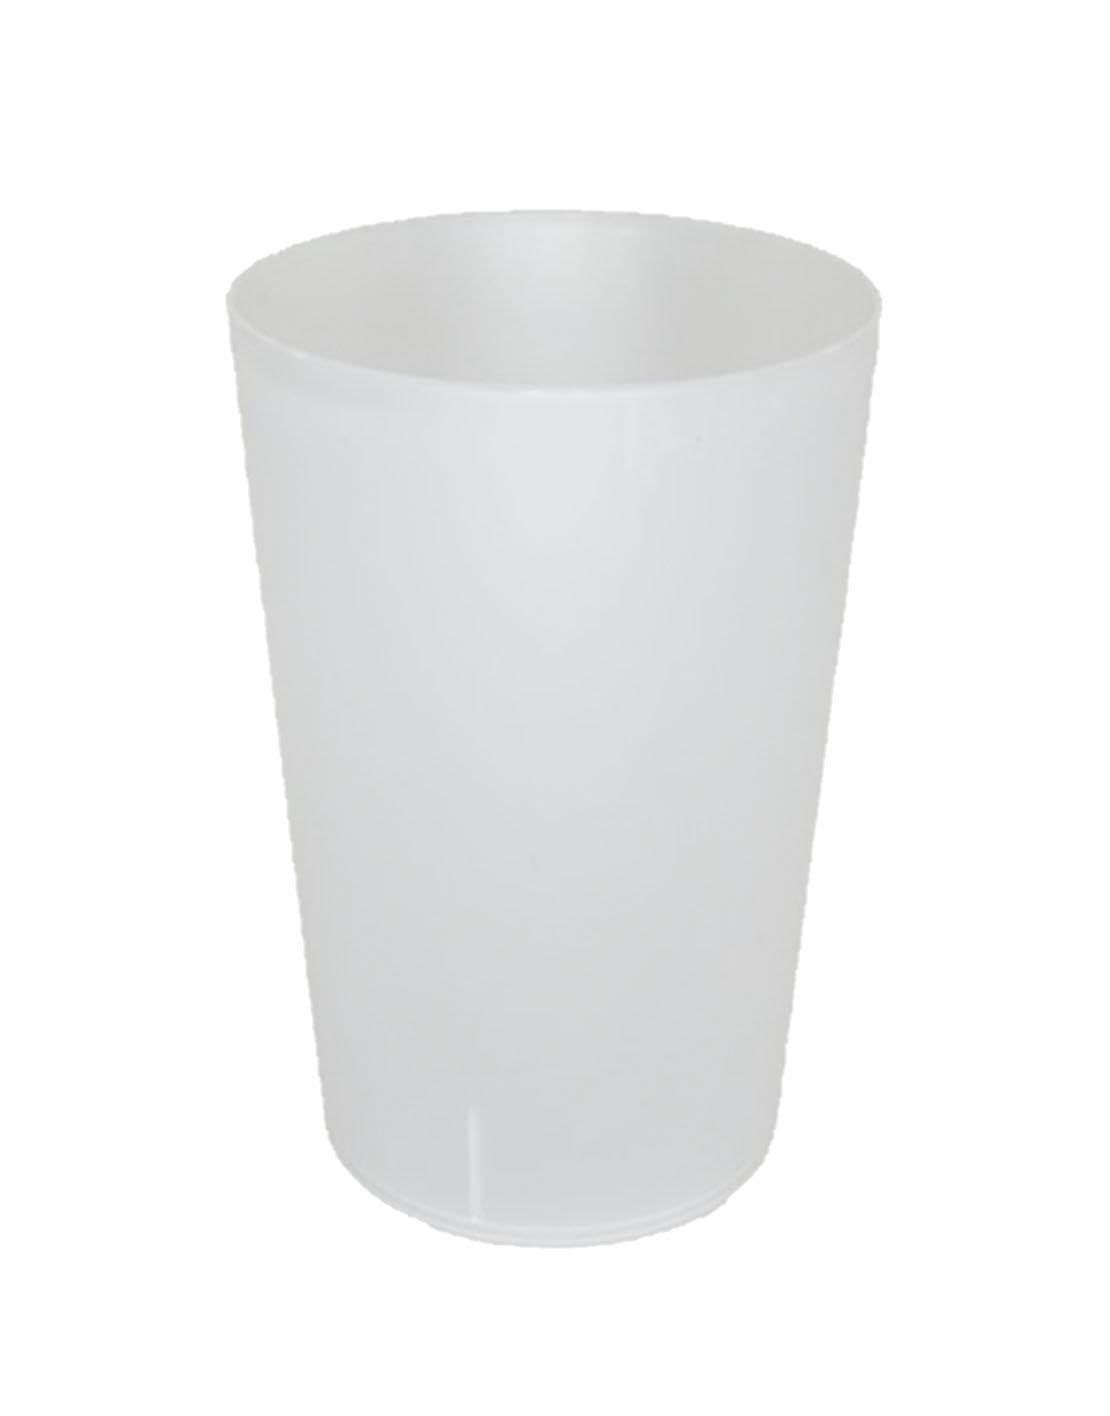 Vaso Reutilizable ECO 900cc